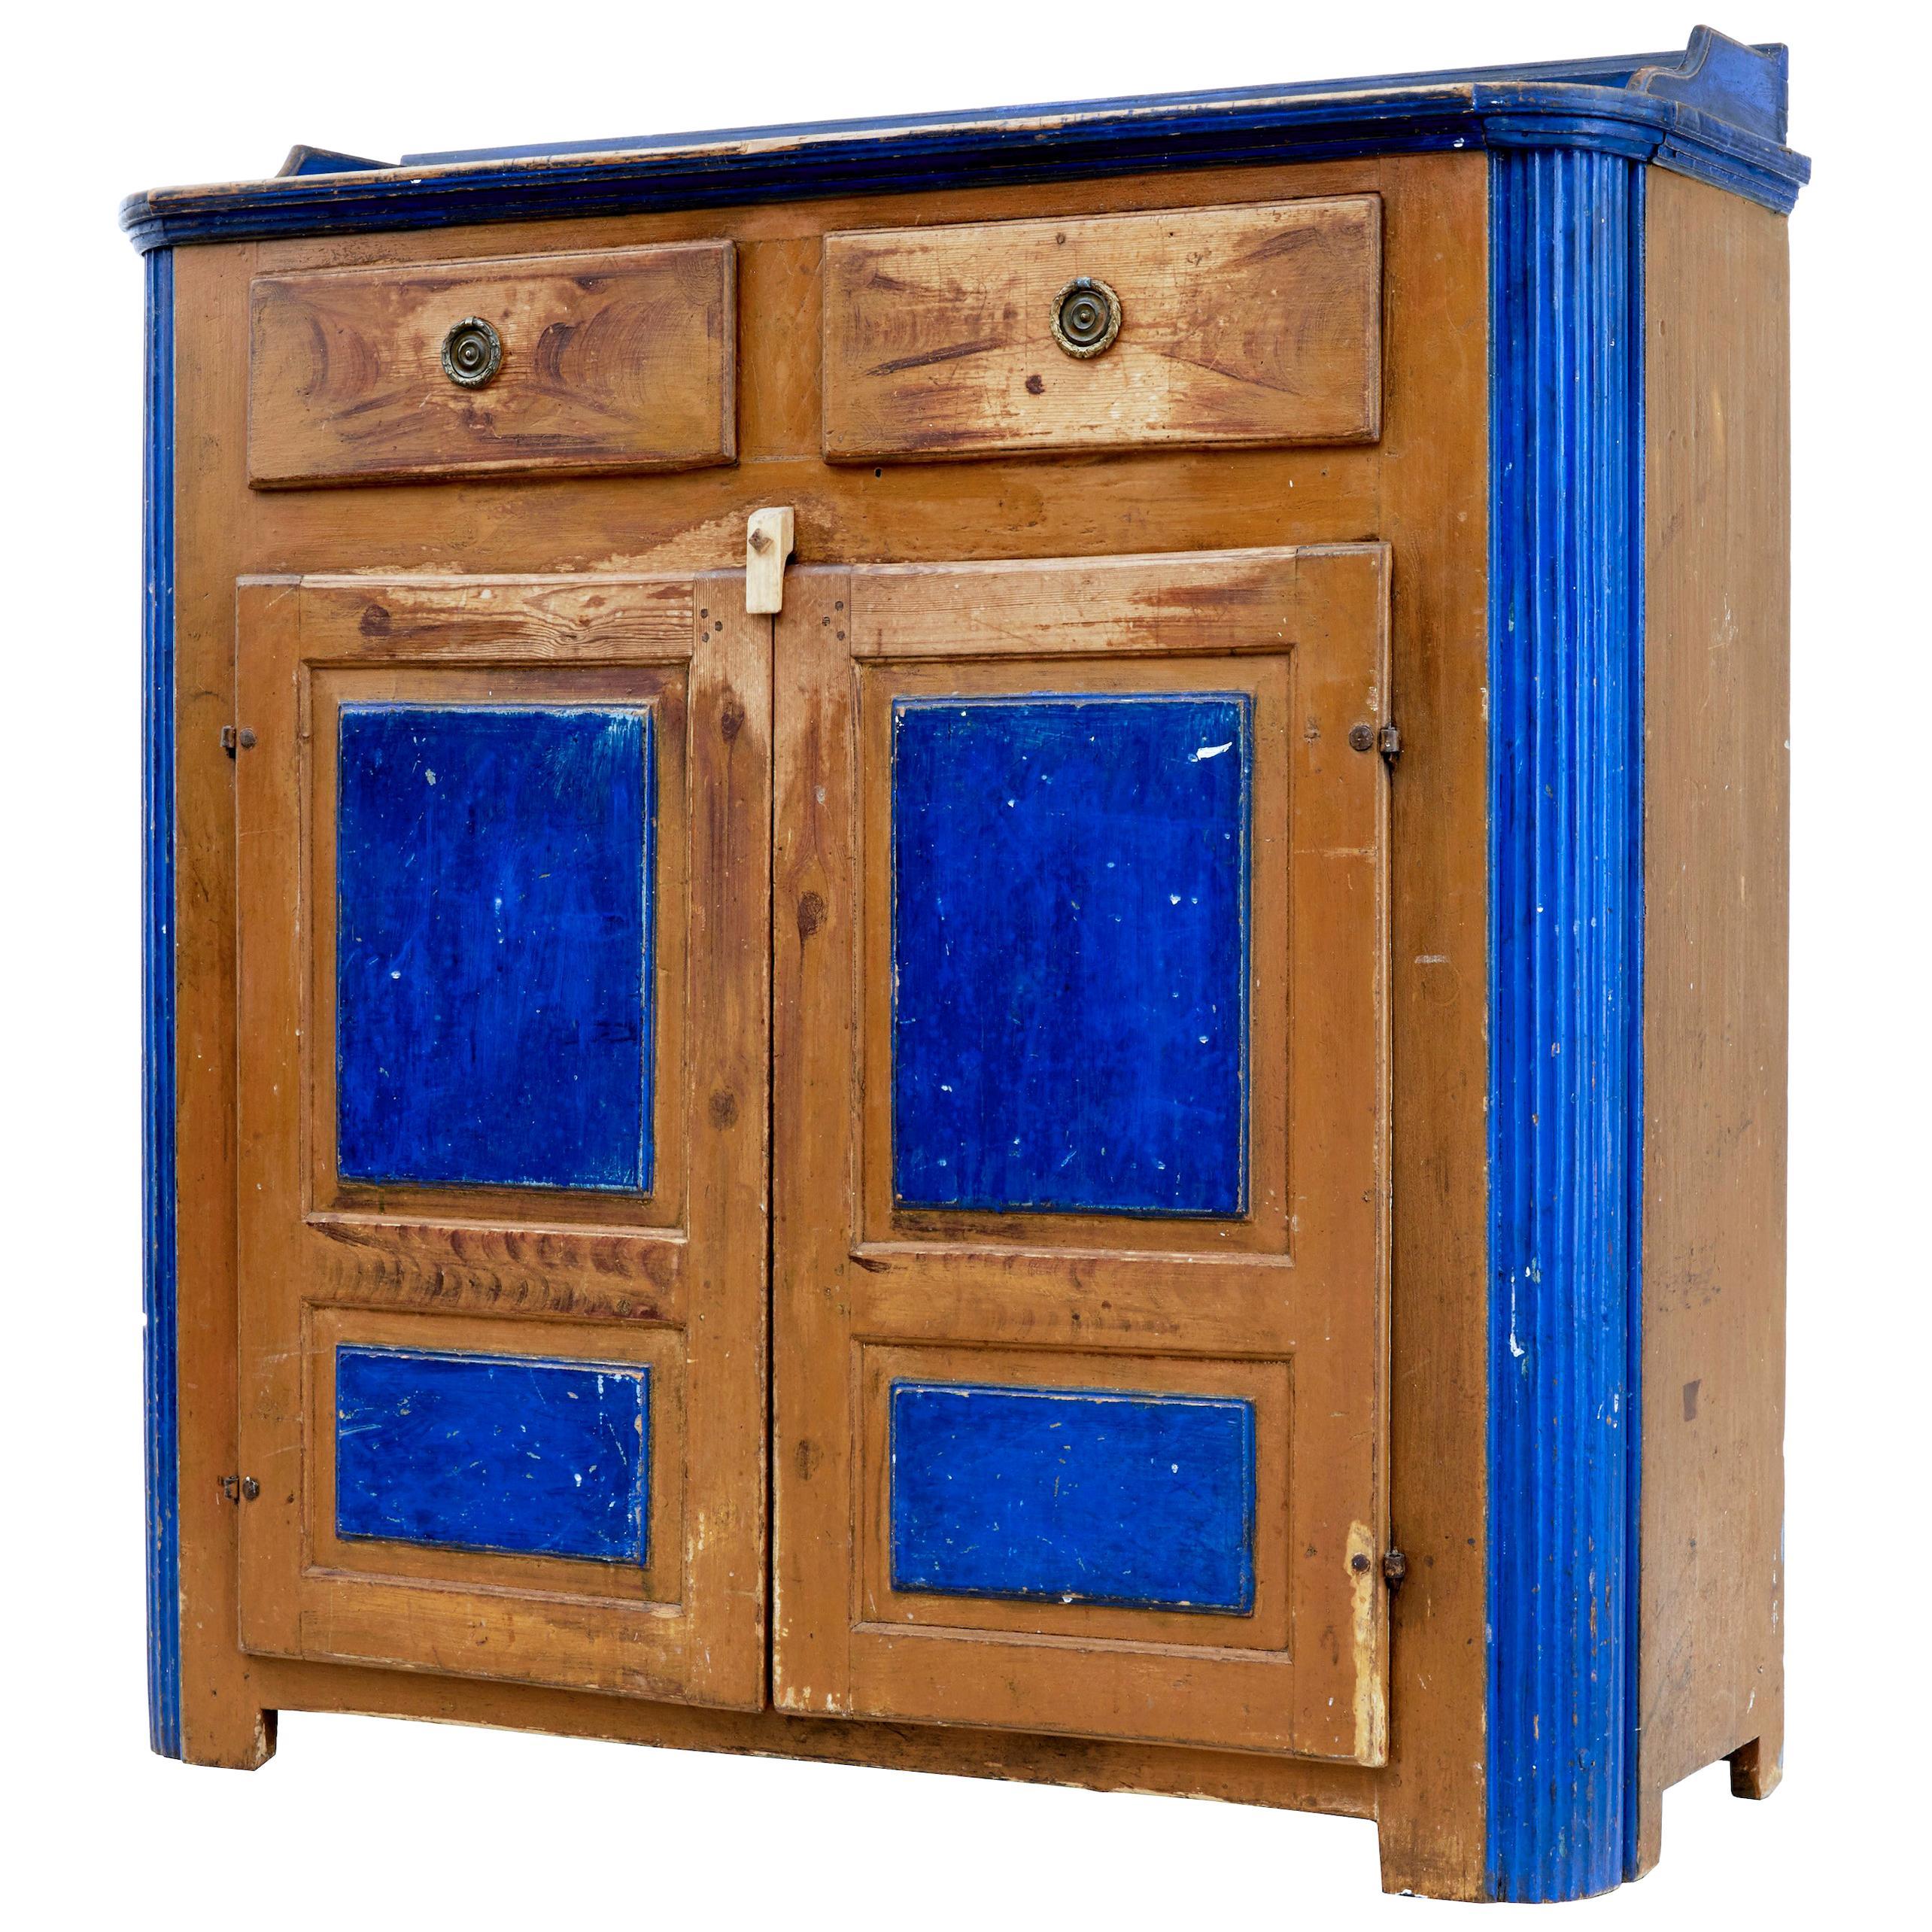 19th Century Swedish Pine Painted Kitchen Cupboard